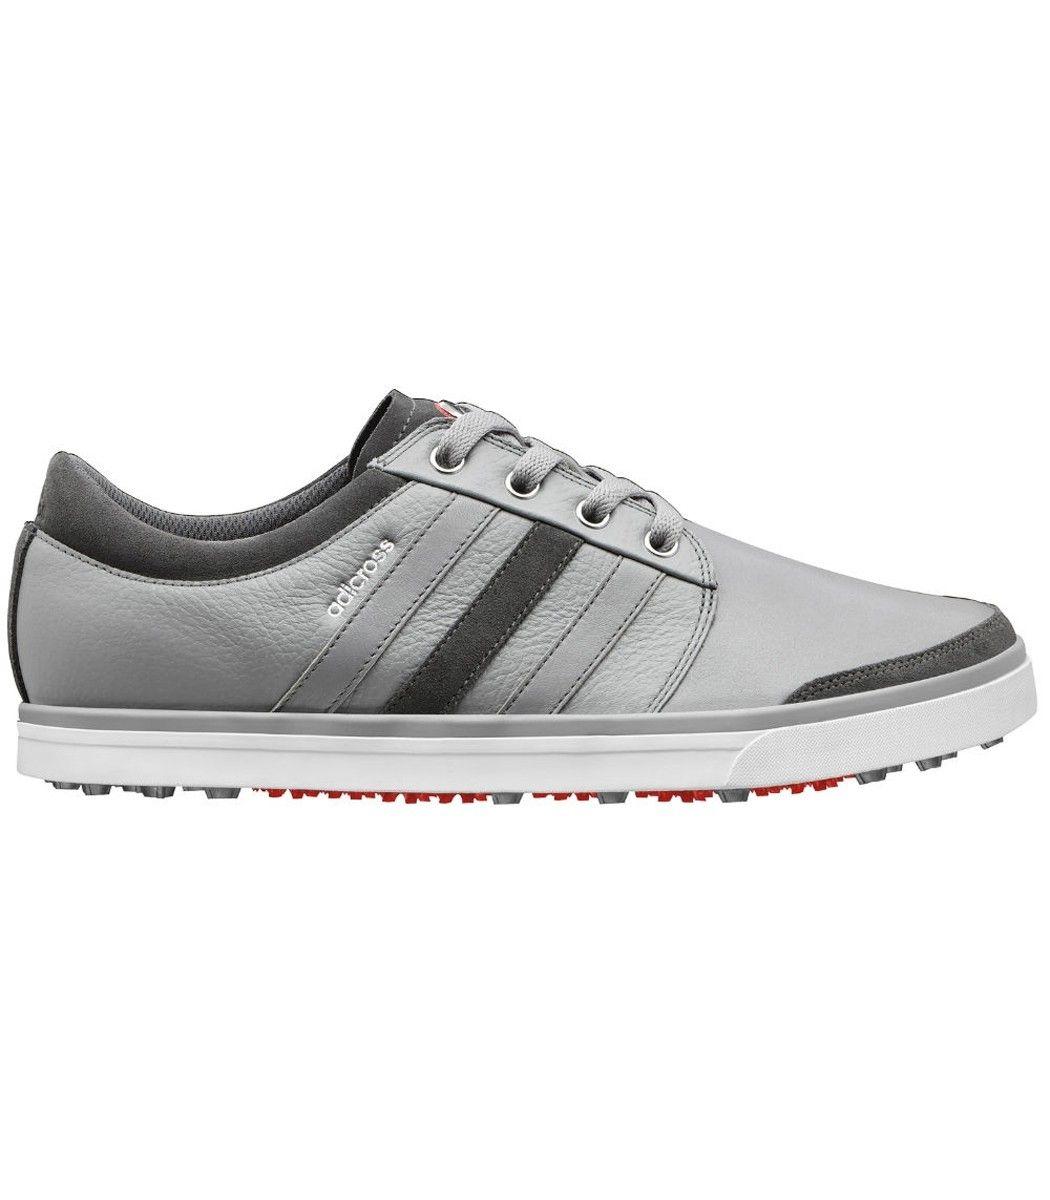 Zapatos de golf Adidas adicross gripmore aluminio / blanco / http: / / blanco www 427002